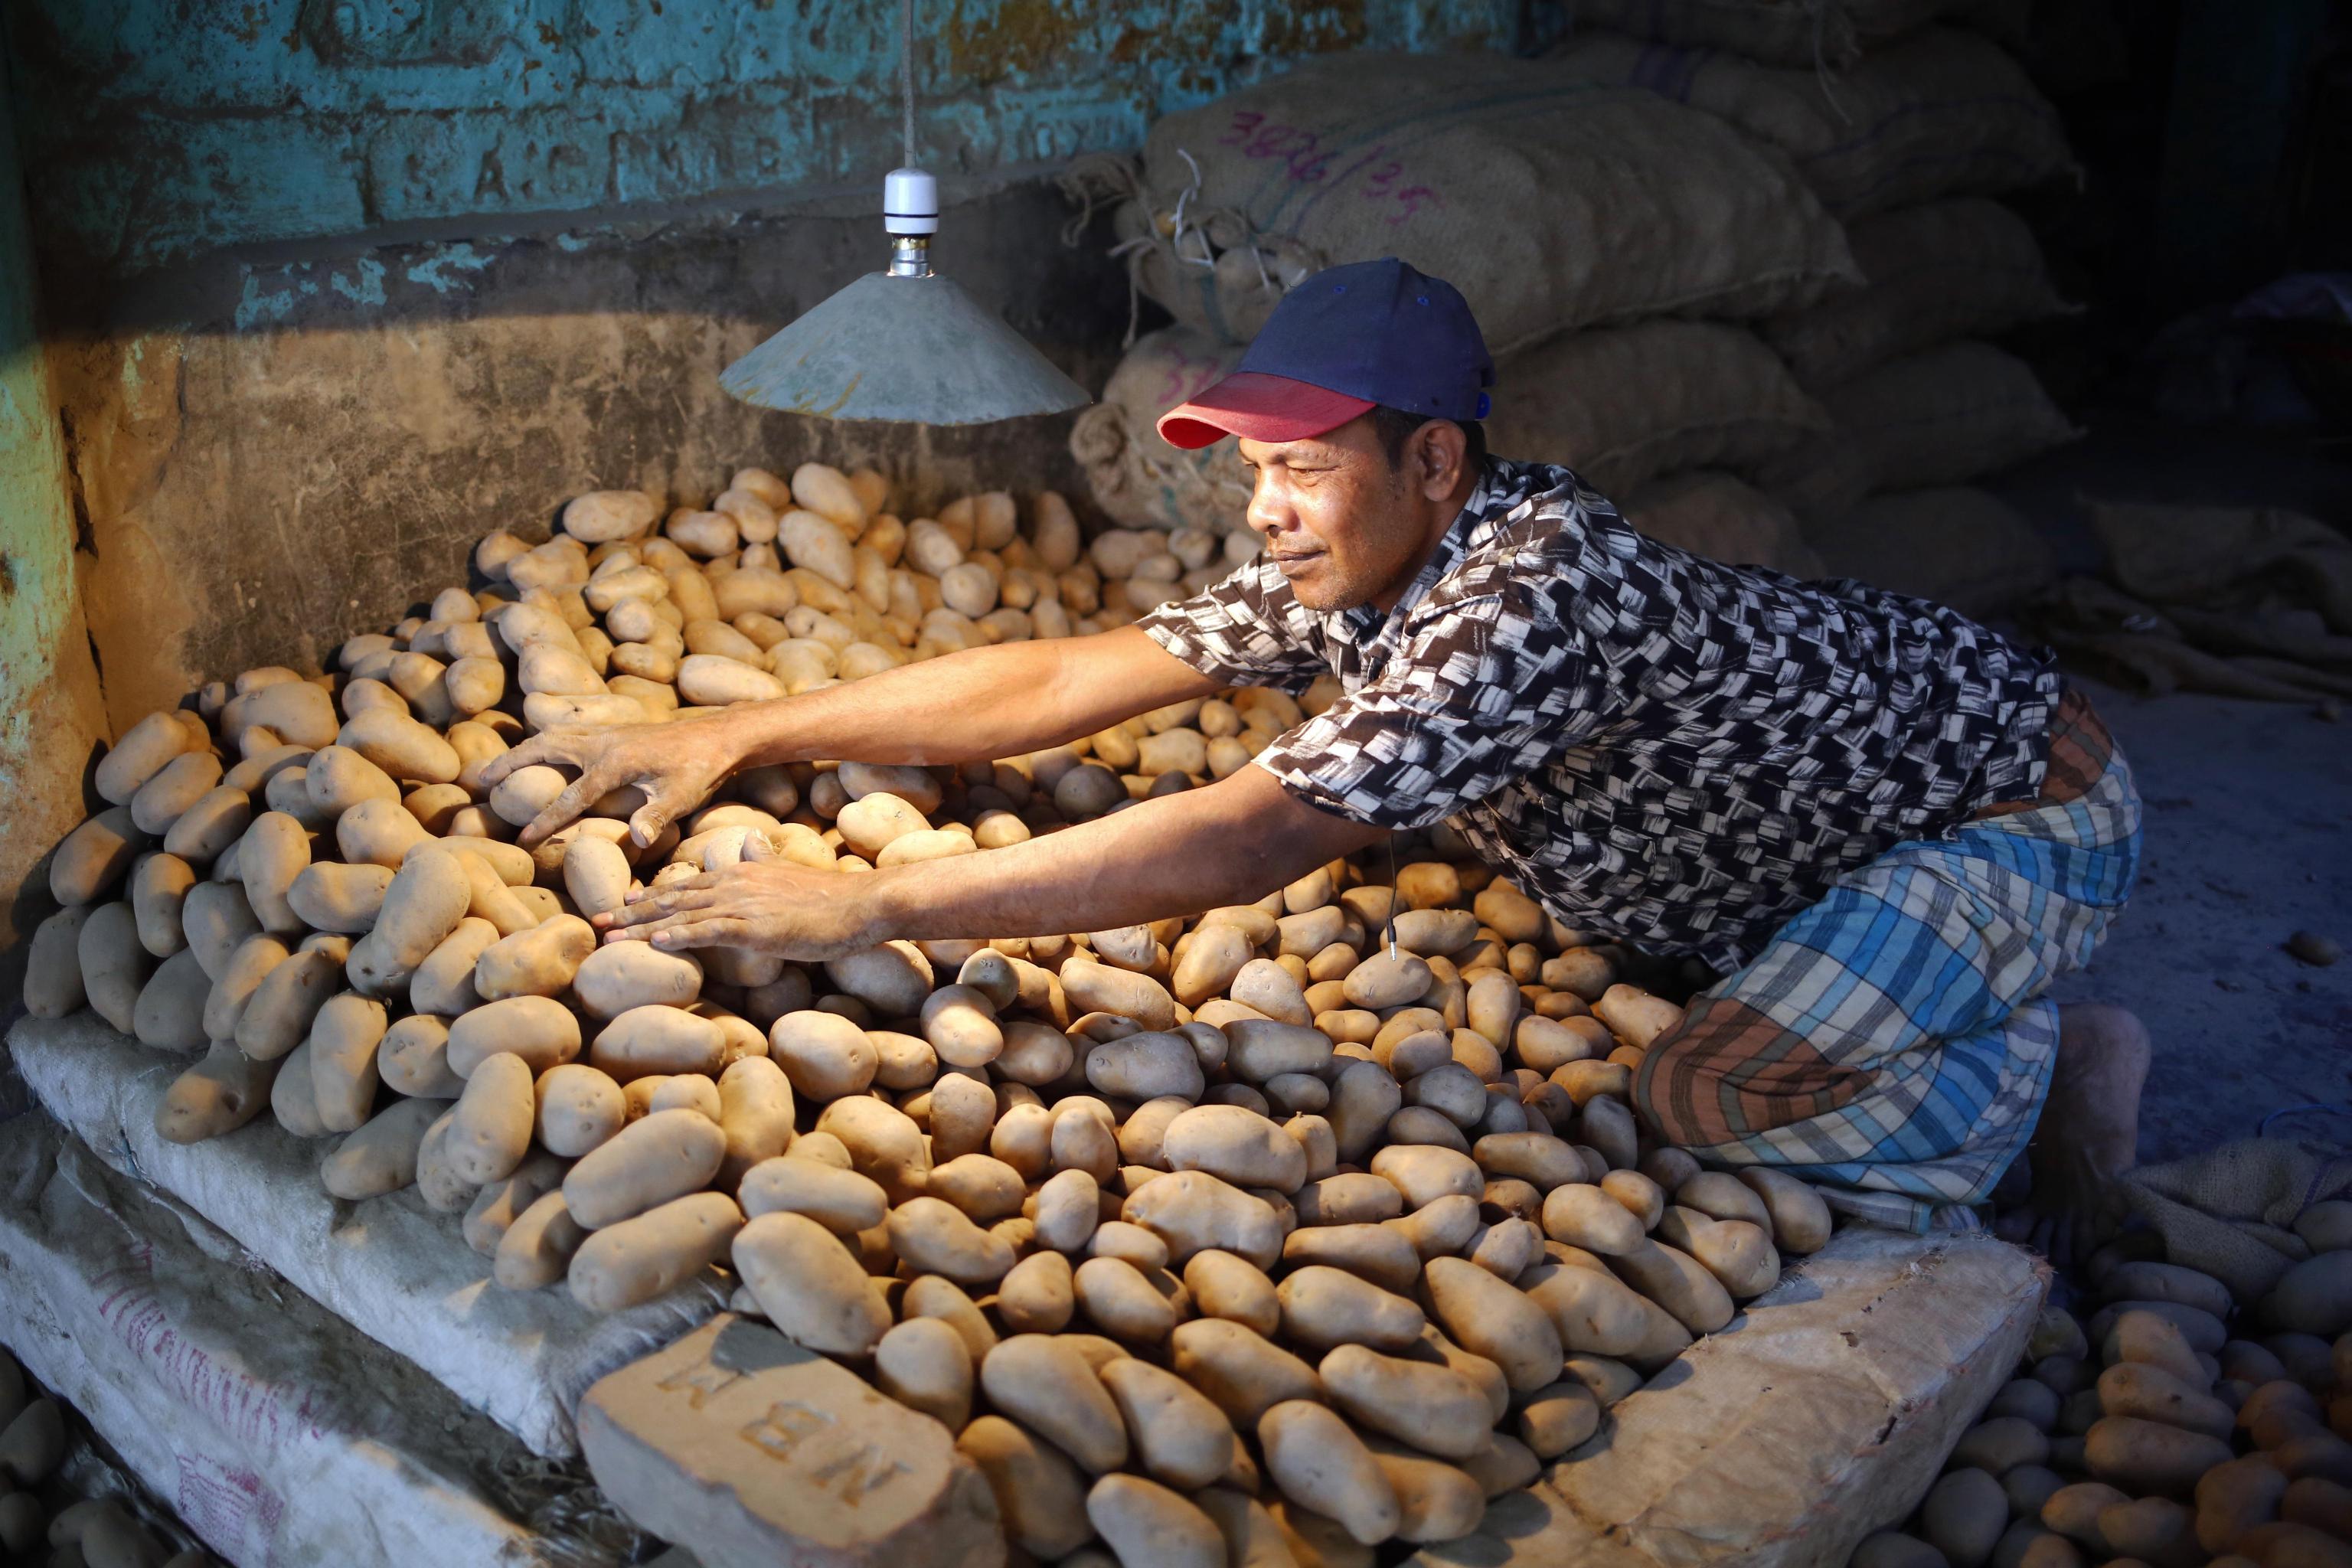 epa07827717 A man works at a vegetal wholesale market in the Shyam Bazar in Dhaka, Bangladesh, 08 September 2019.  EPA/MONIRUL ALAM